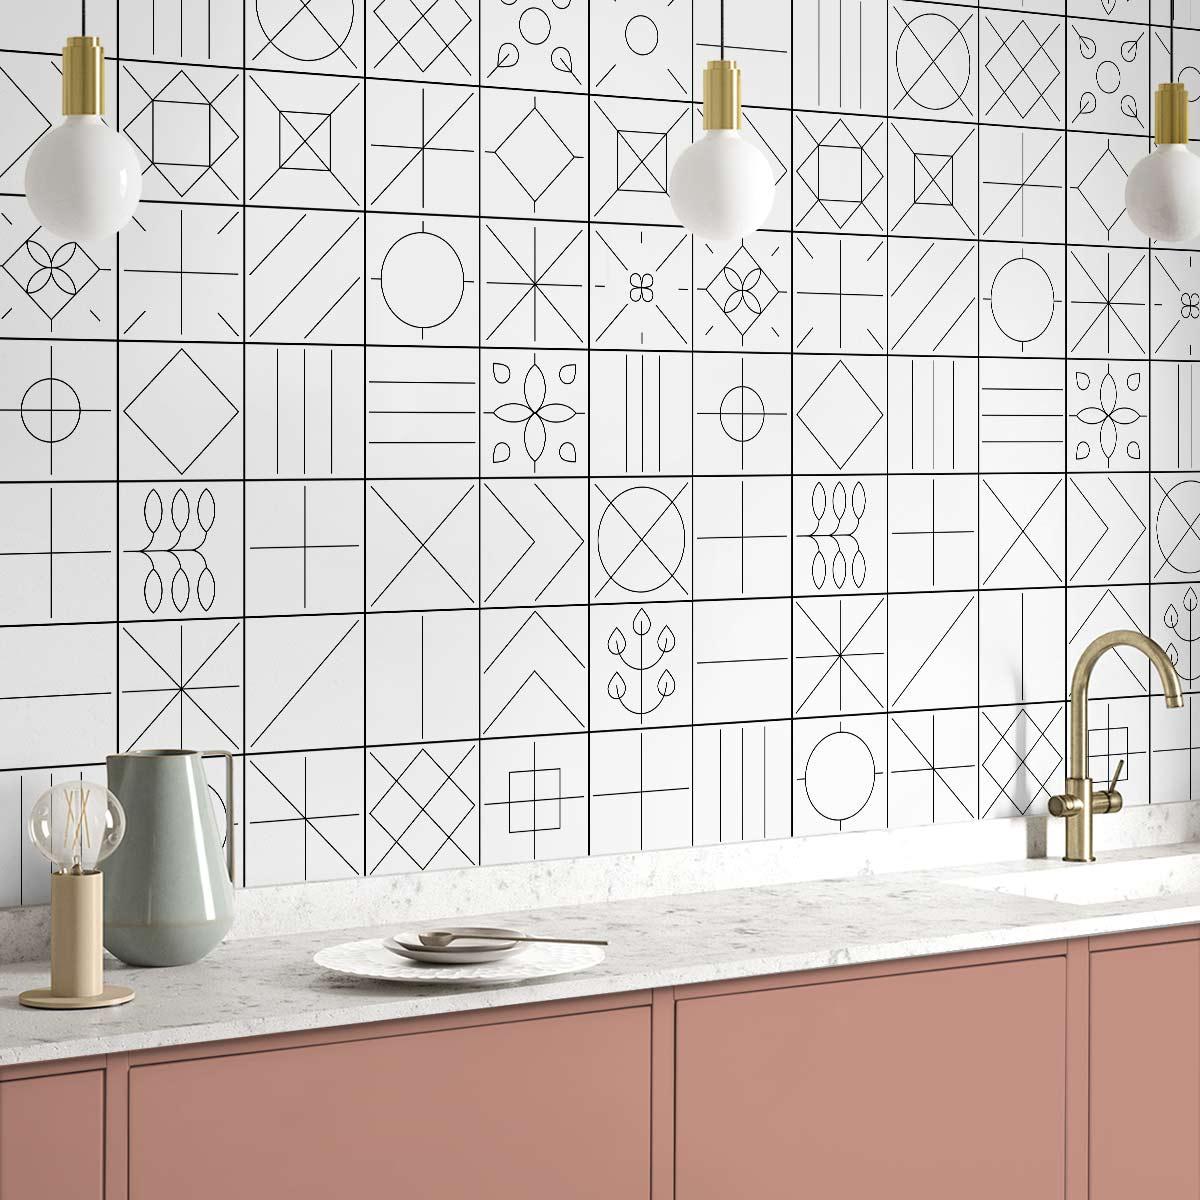 vinilo-geometrico-azul-volare-lavable-decorar-y-forrar-frentes-de-cocina-lokoloko